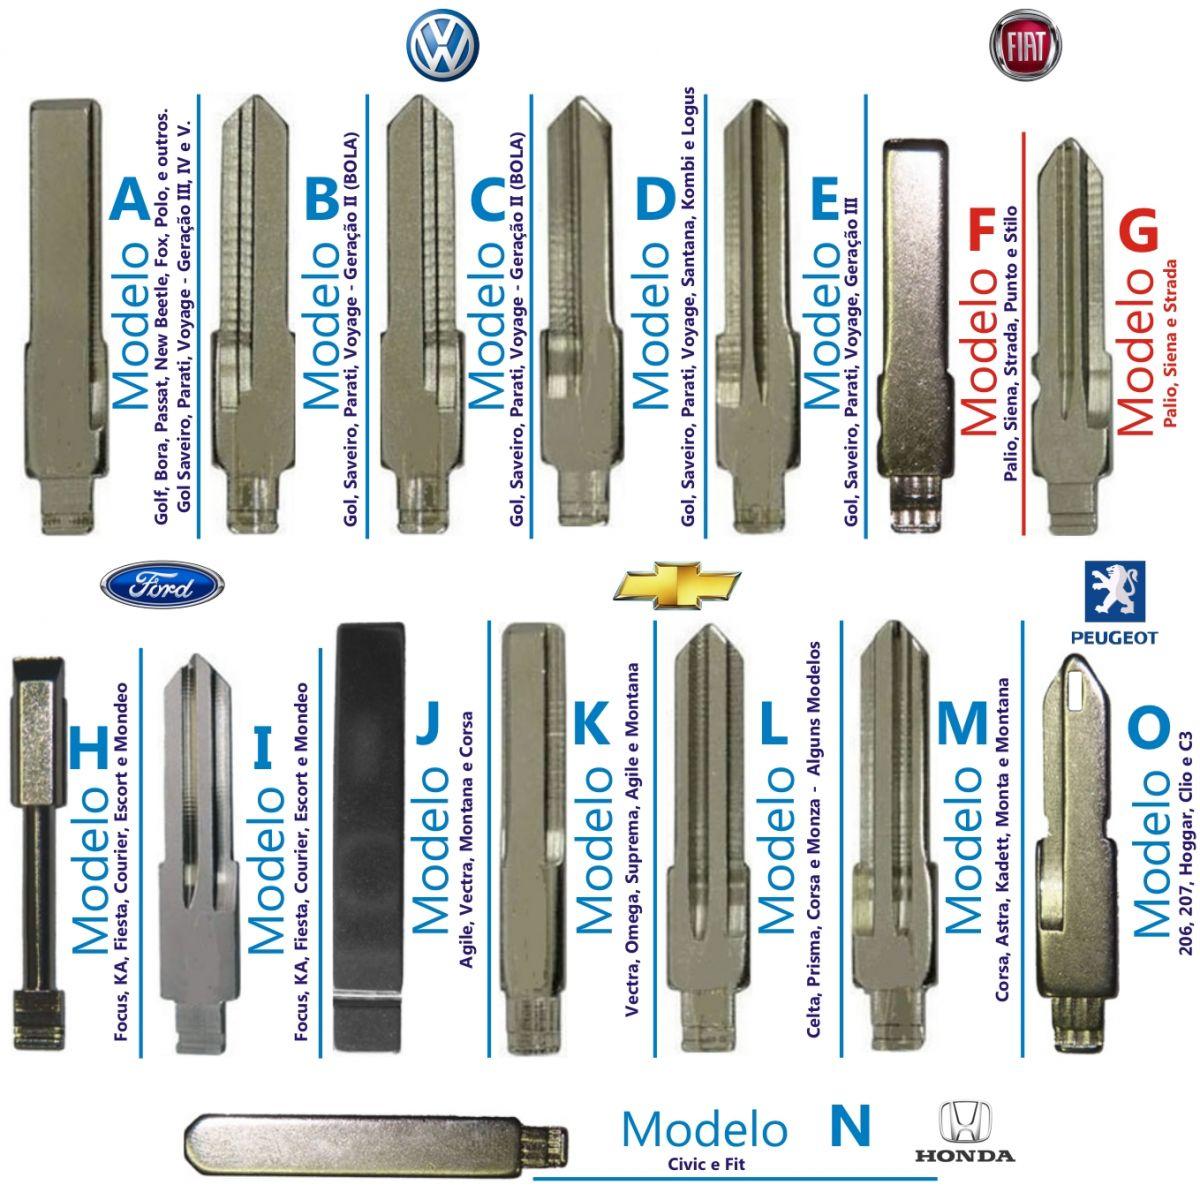 Chave Canivete Polo + Placa Alarme Positron + Lamina VW Chevrolet GM Fiat Ford Peugeot Renault